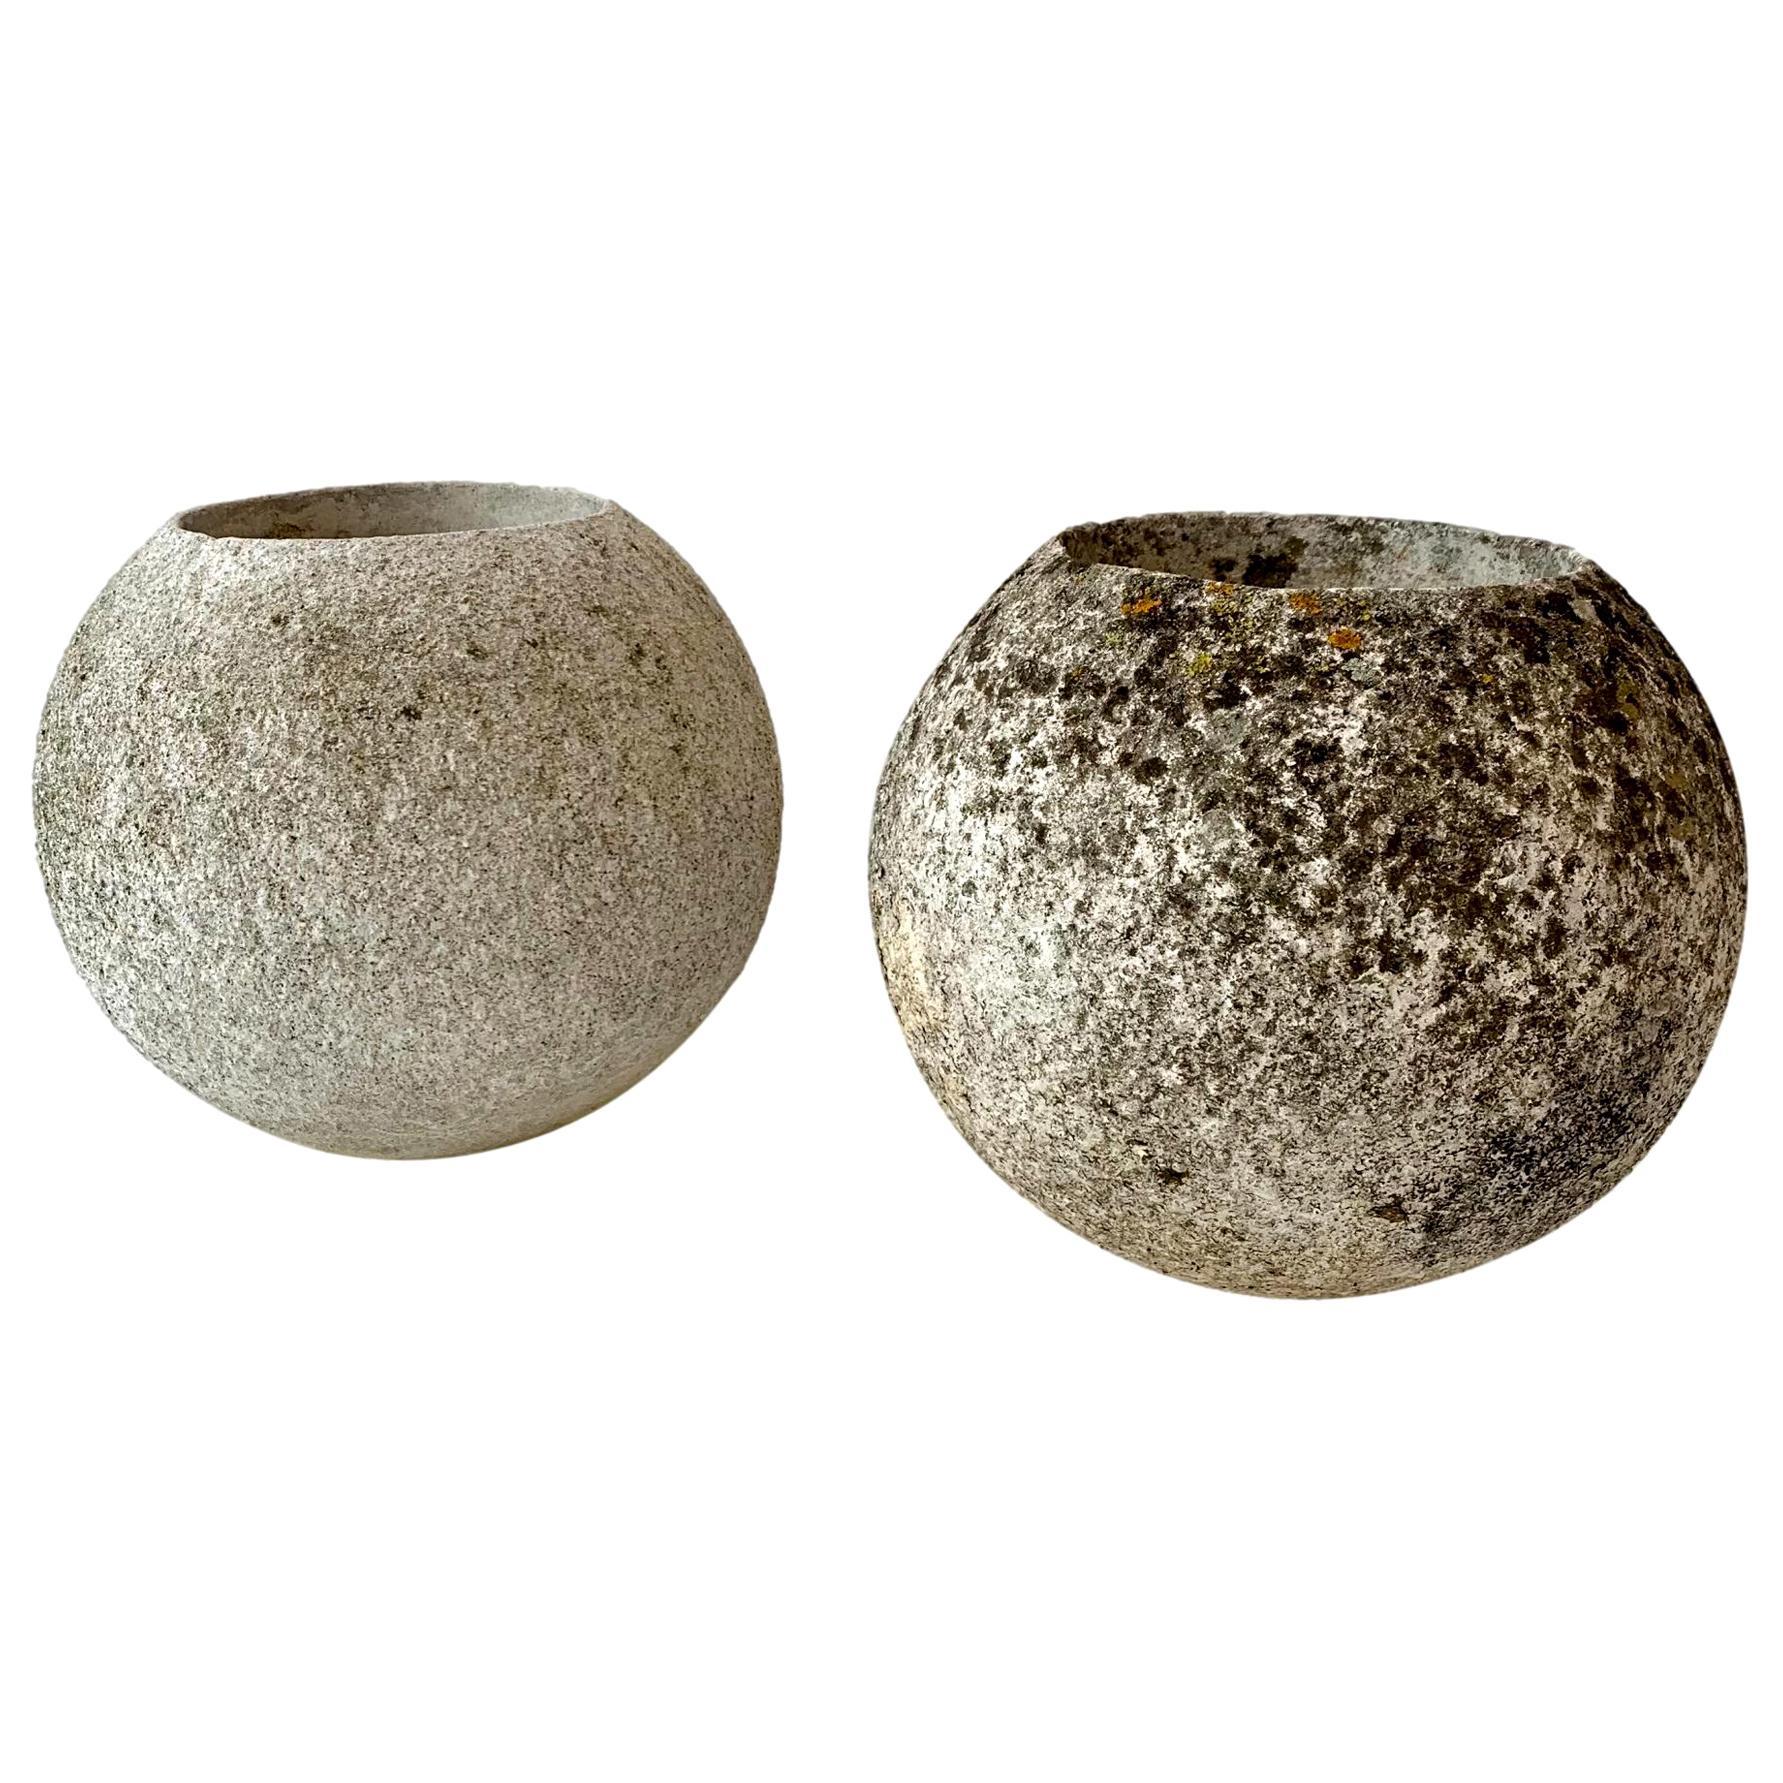 Willy Guhl Concrete Ball Planters